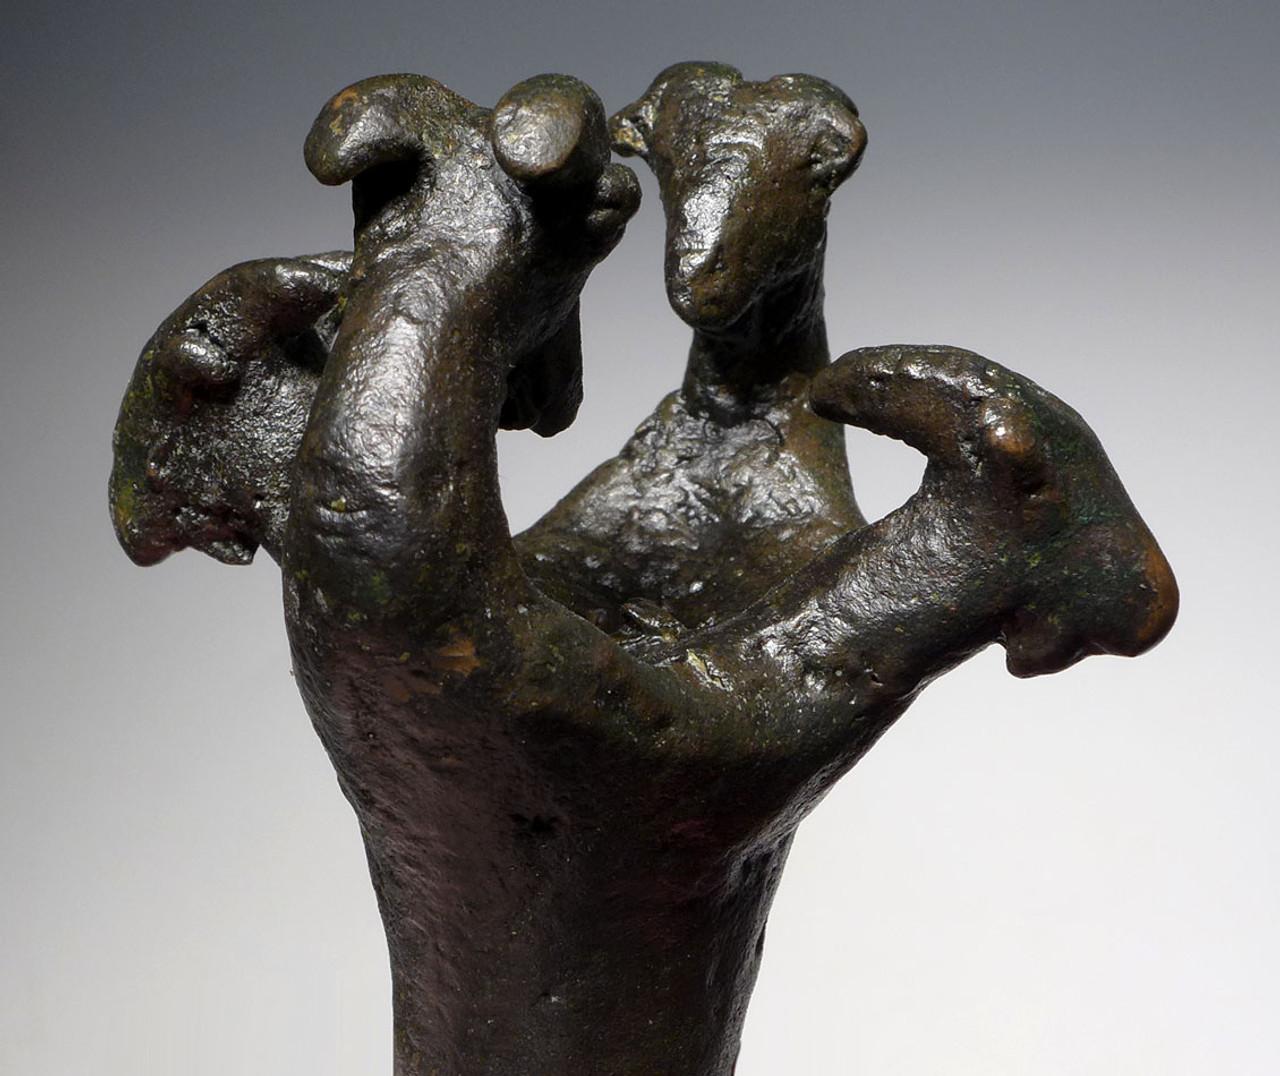 UNUSUAL ANCIENT BRONZE LURISTAN RAMS HEAD FIGURAL FINIAL MACE HEAD FROM THE NEAR EAST  *LUR185